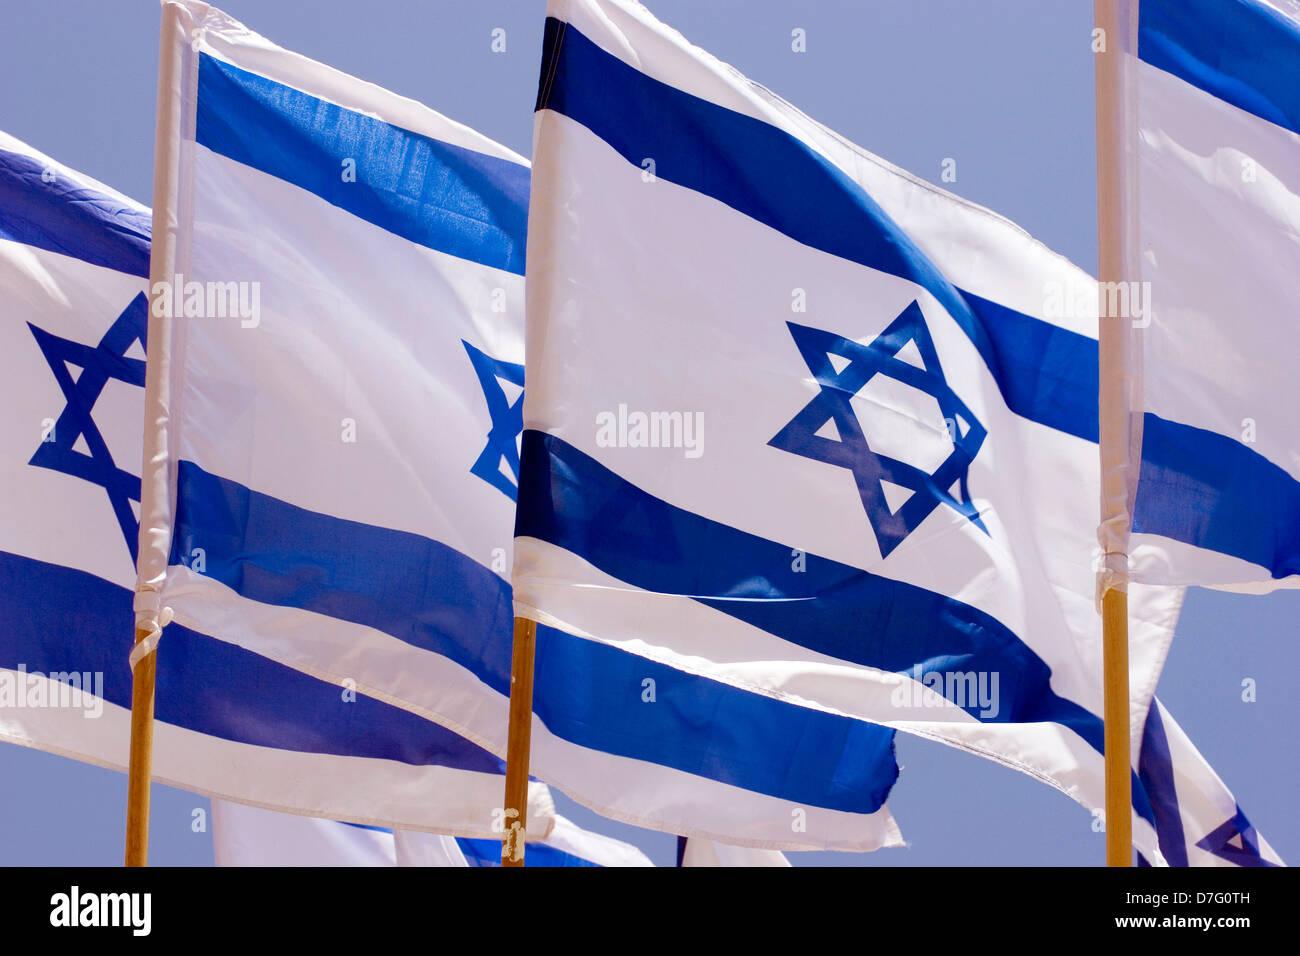 the israeli flags - Stock Image